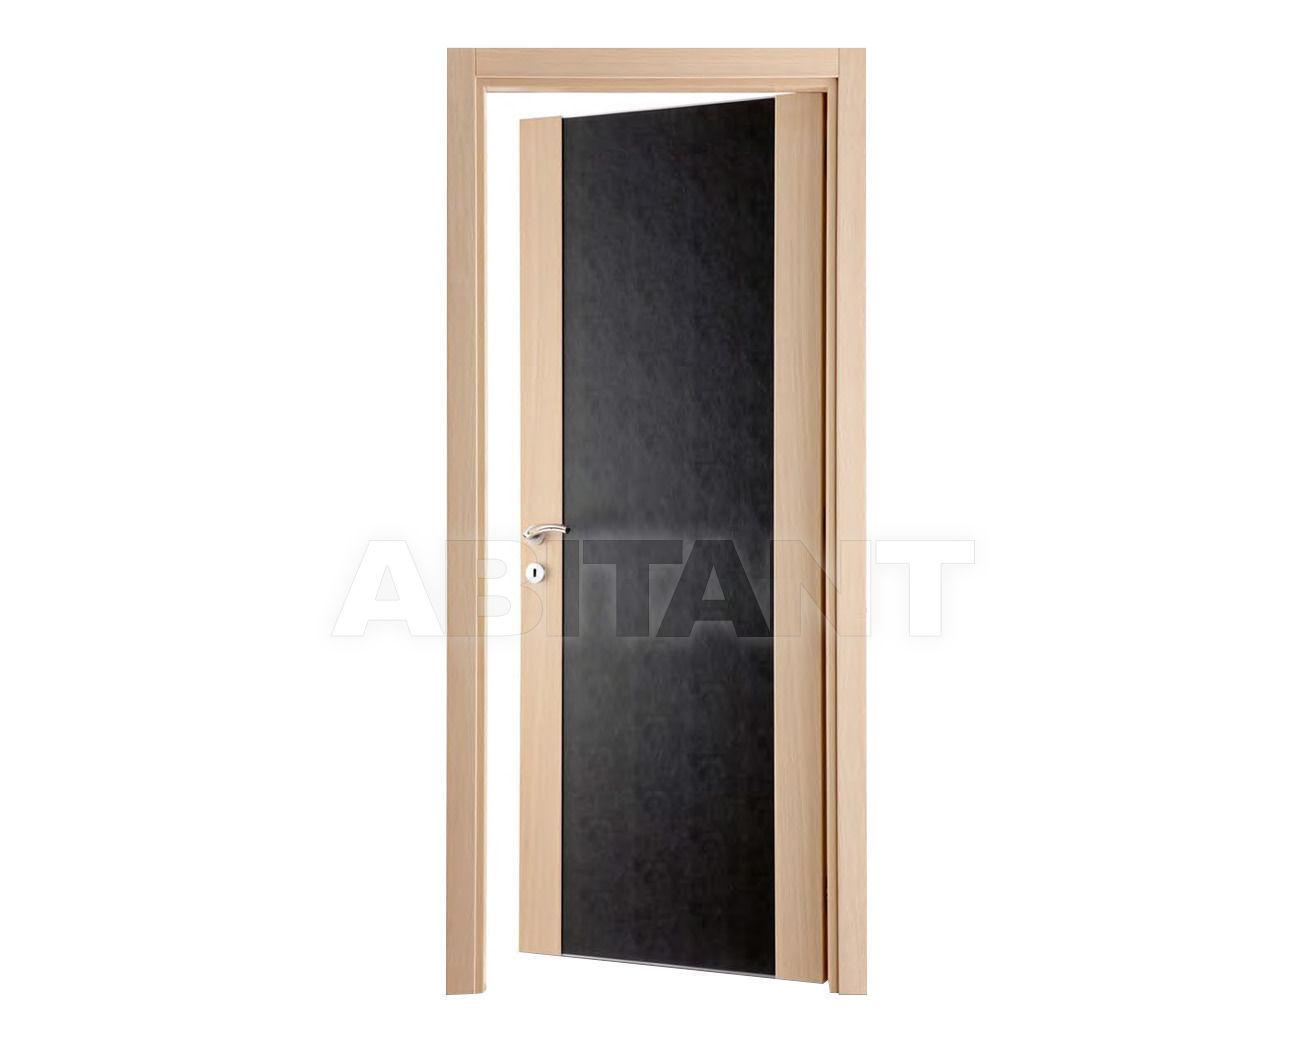 Купить Дверь деревянная Fioravazzi Lisce S35 DANIA SKIN PIENO FIORE